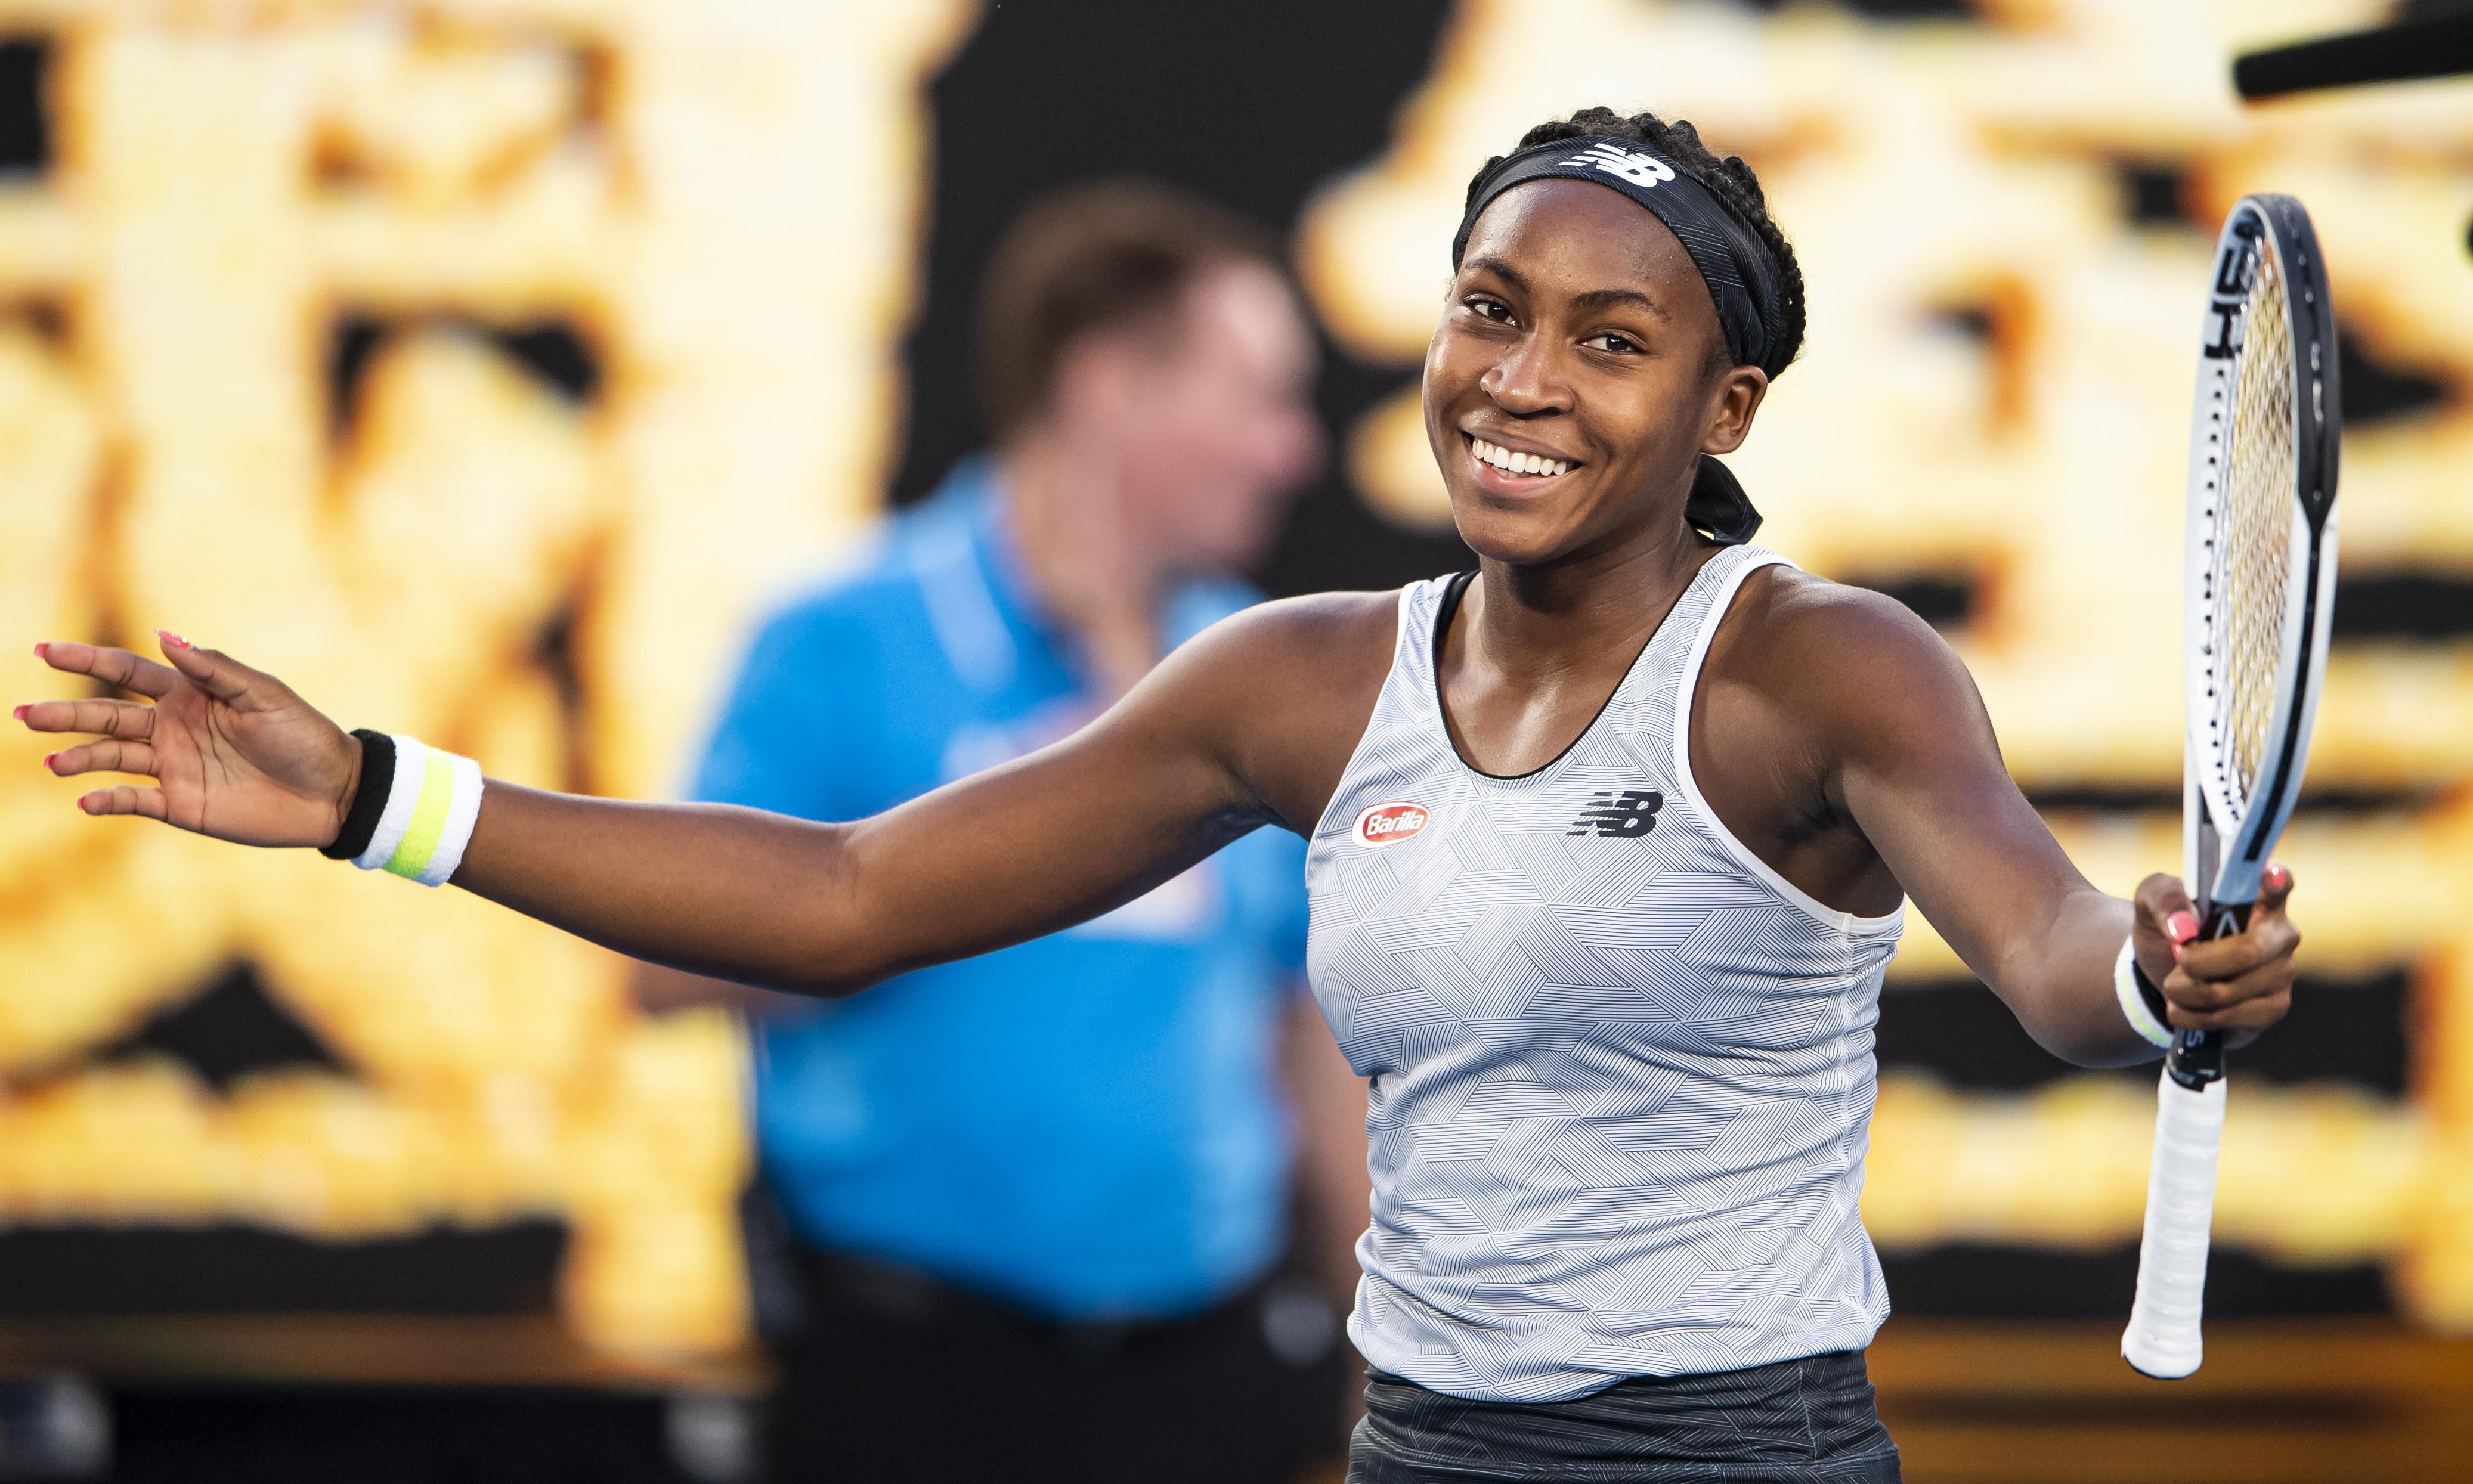 Coco Gauff routs defending champion Naomi Osaka at Australian Open